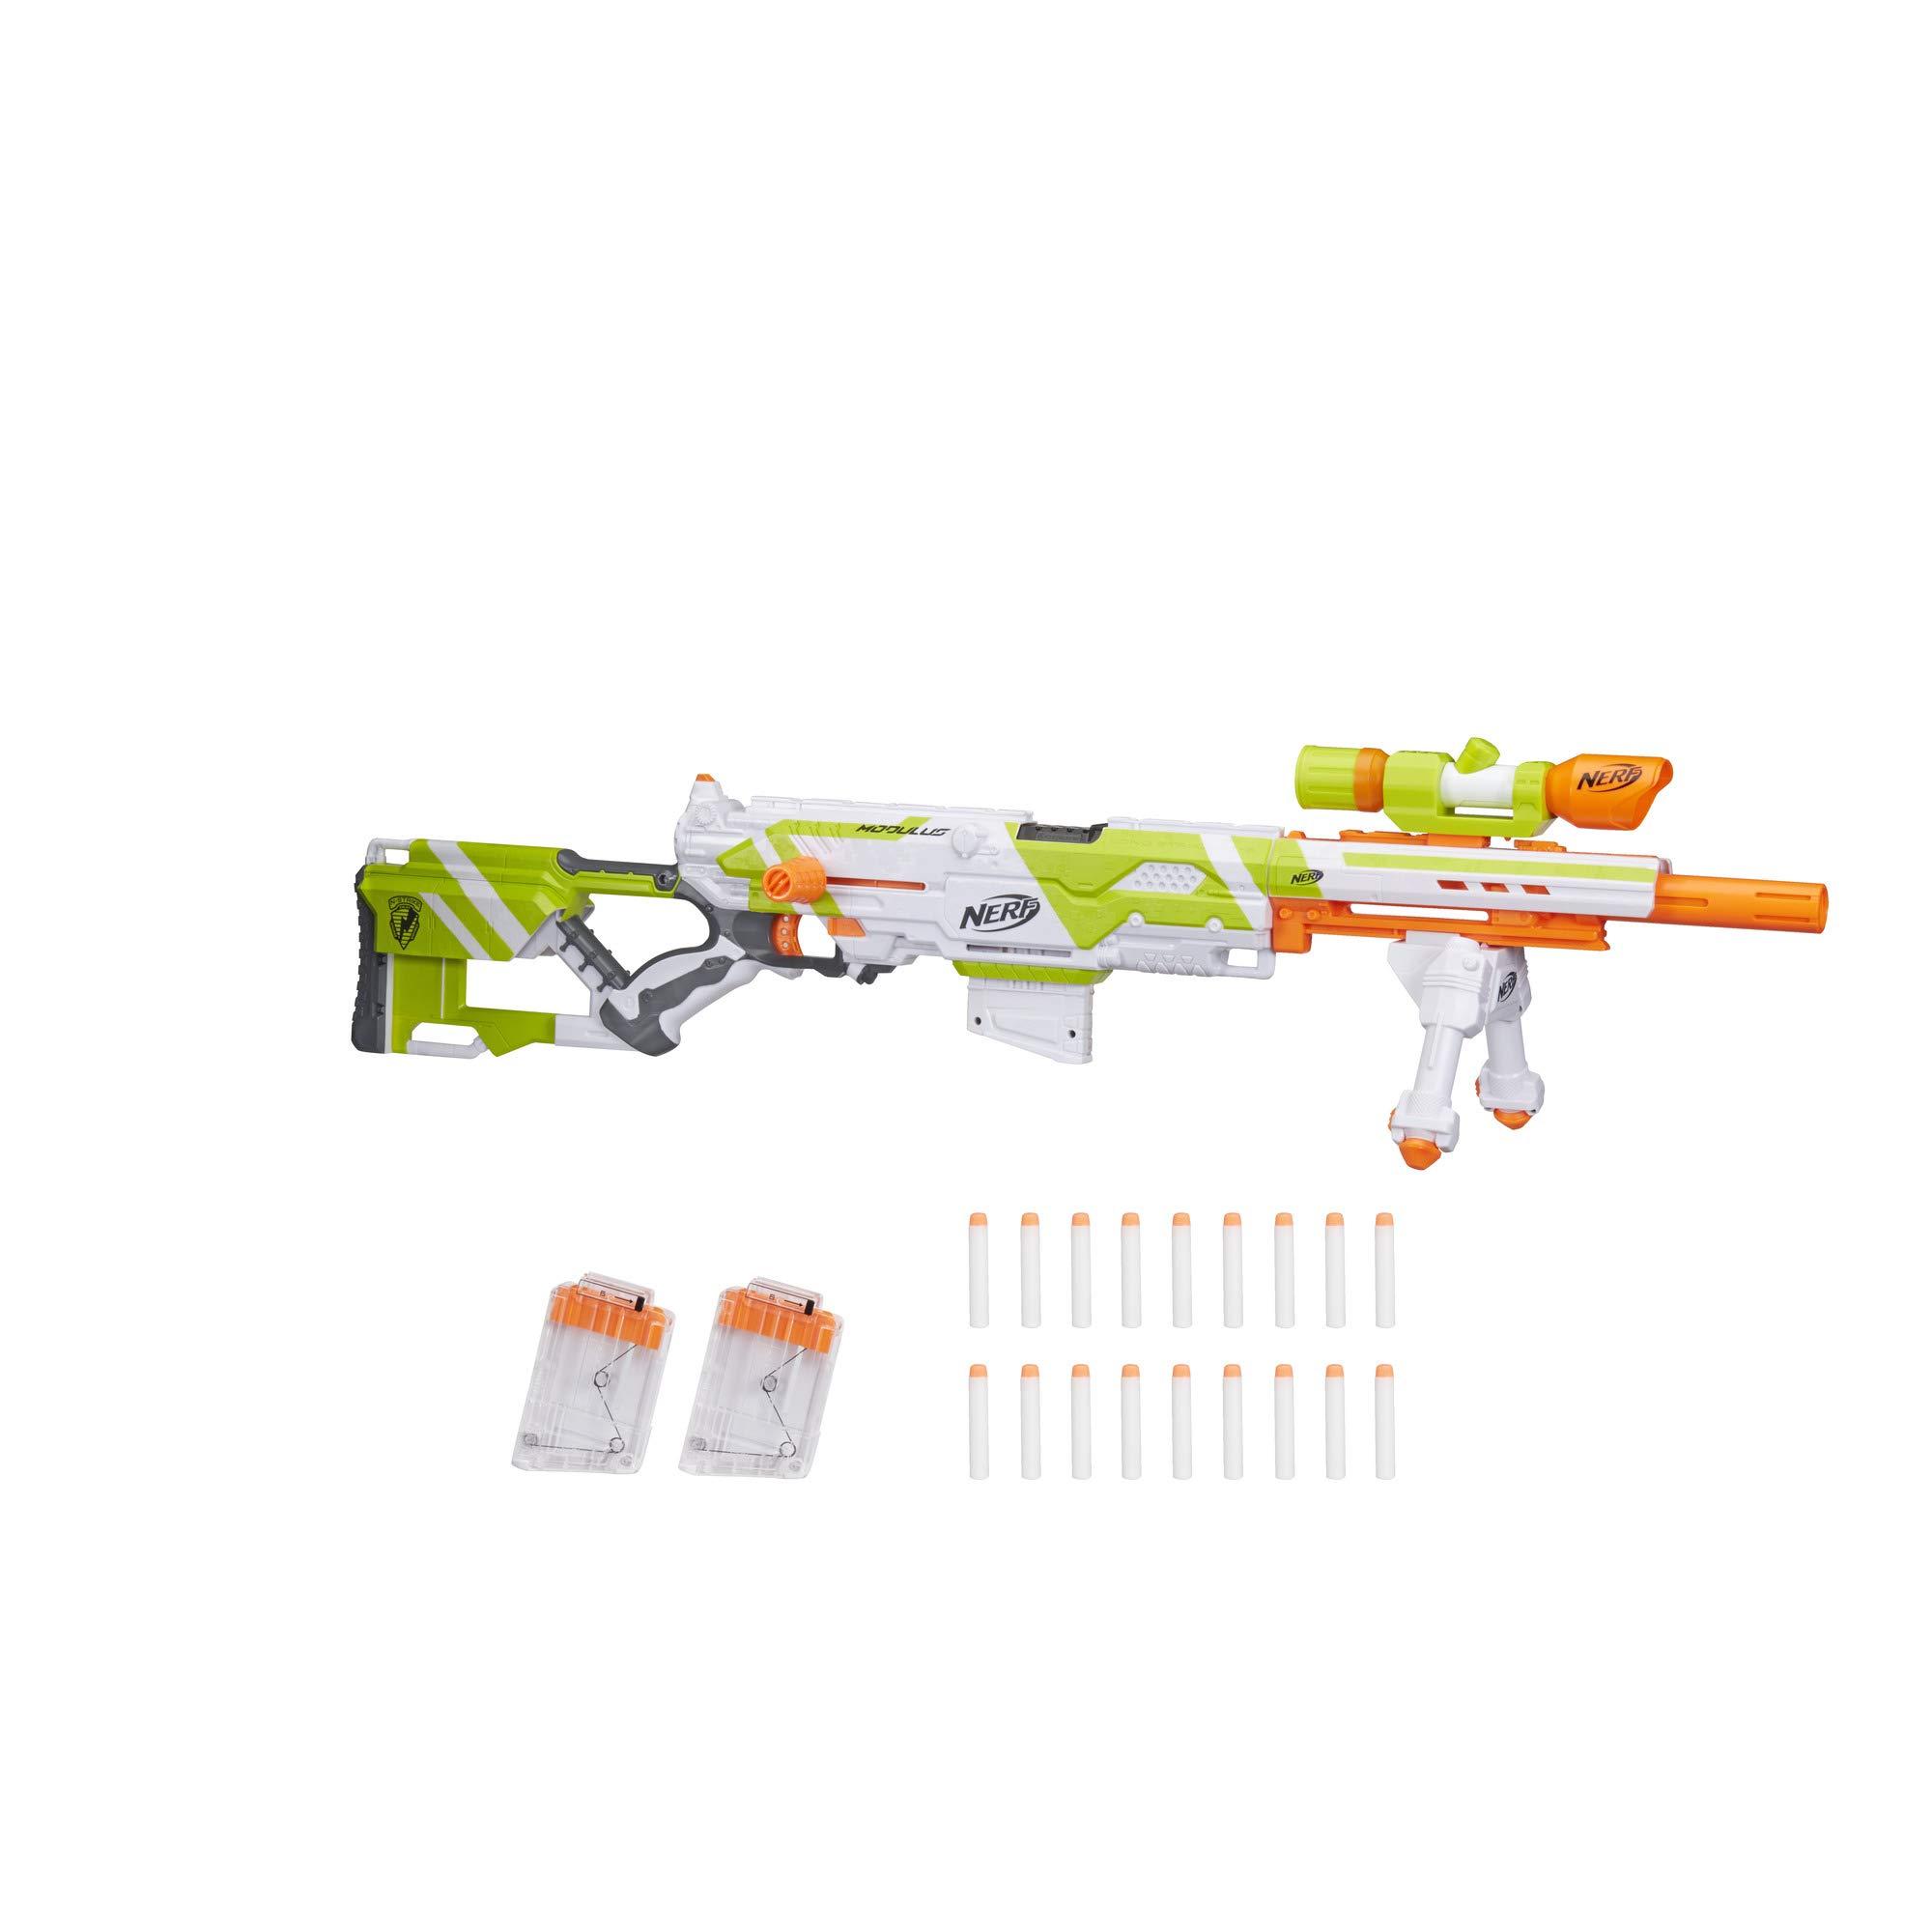 Longstrike Nerf Modulus Toy Blaster with Barrel Extension, Bipod, Scopes, 18 Modulus Elite Darts & 3 Six-Dart Clips (Amazon Exclusive) by NERF